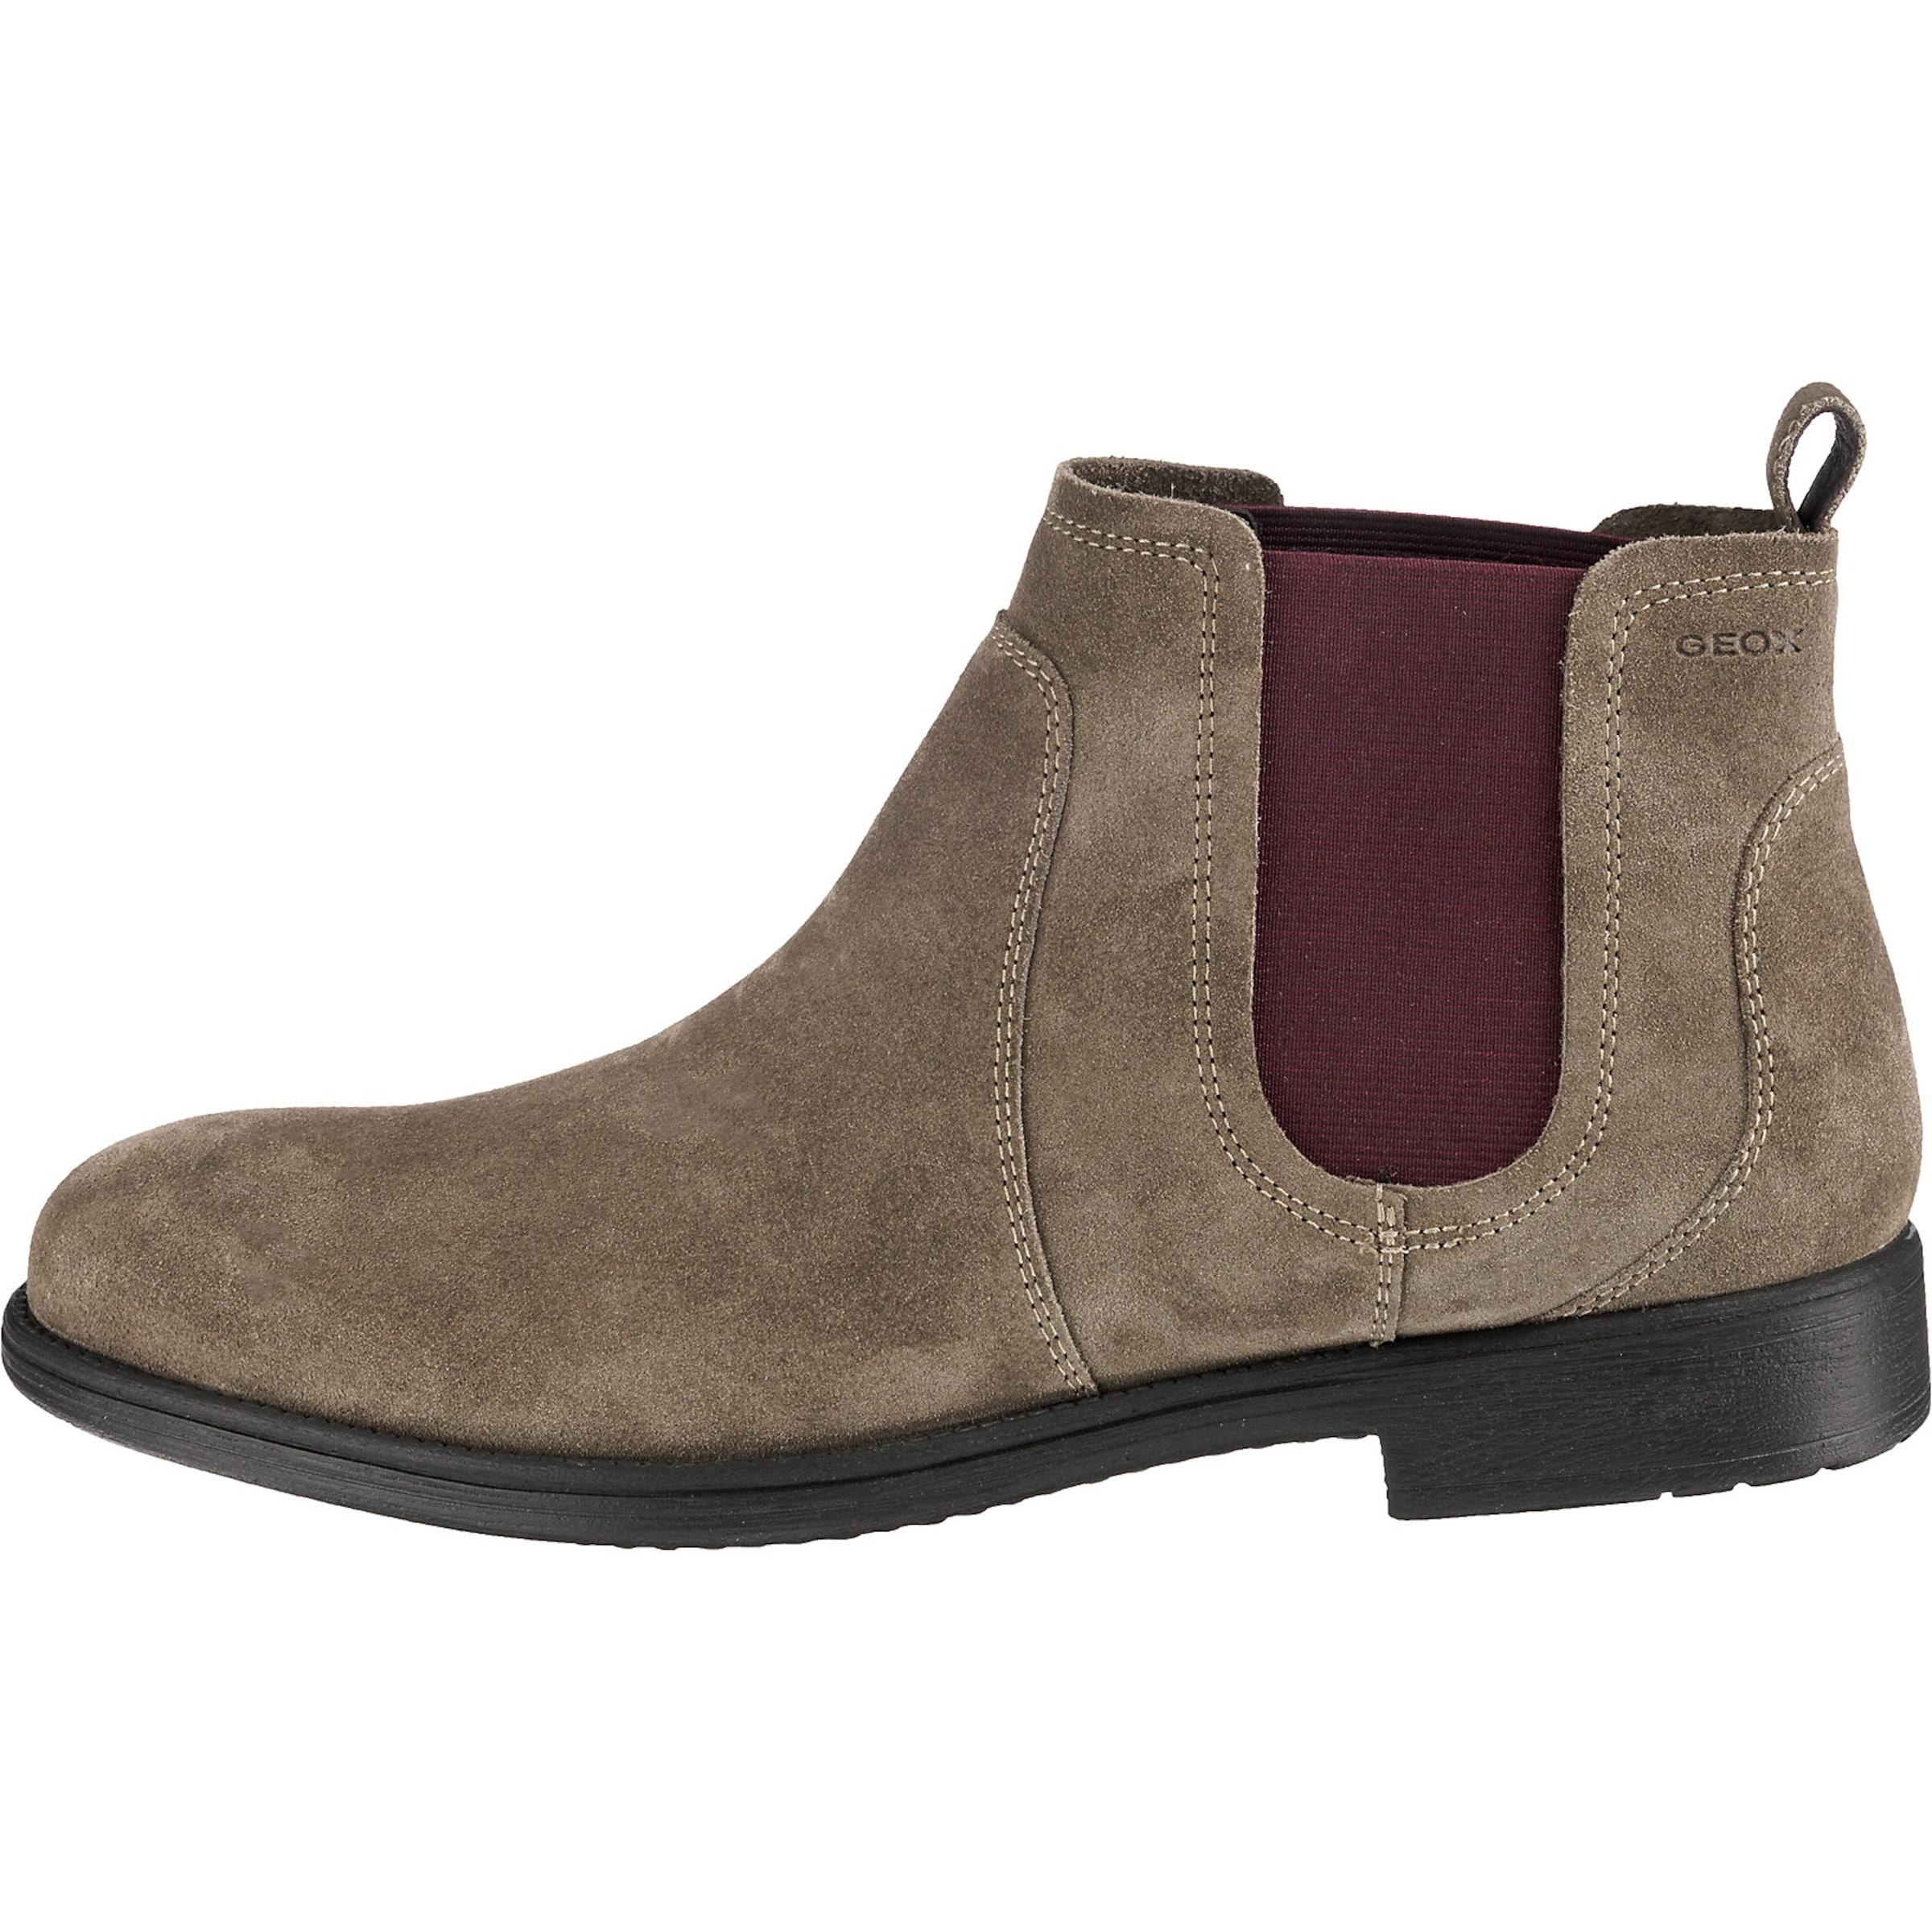 'u Jaylon' In GreigeBeere Boots Geox Chelsea c4q3A5RjL